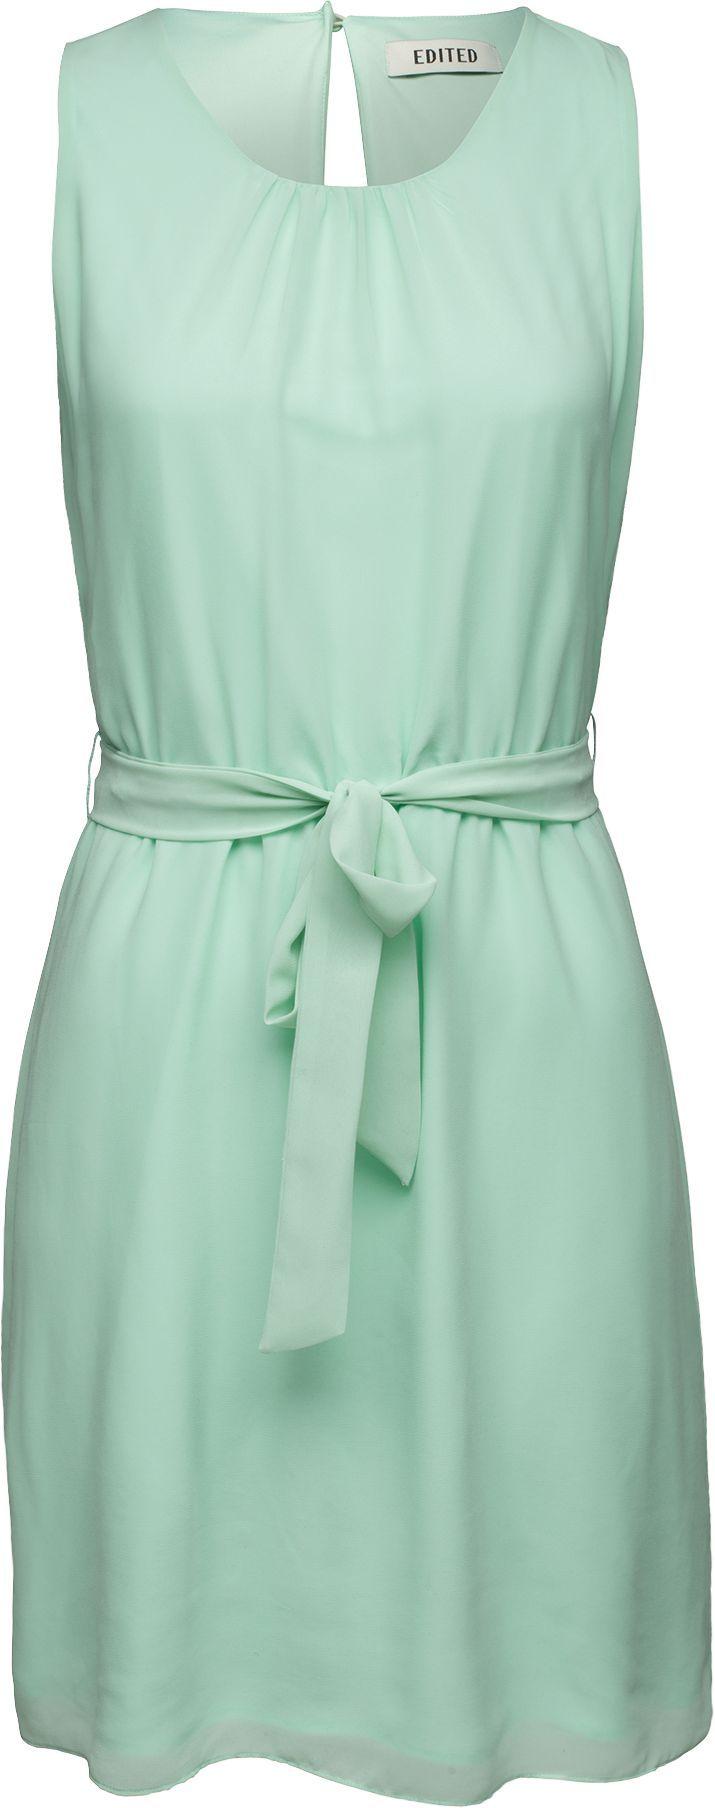 55 best kleider images on Pinterest | Abendkleider, Homecoming ...